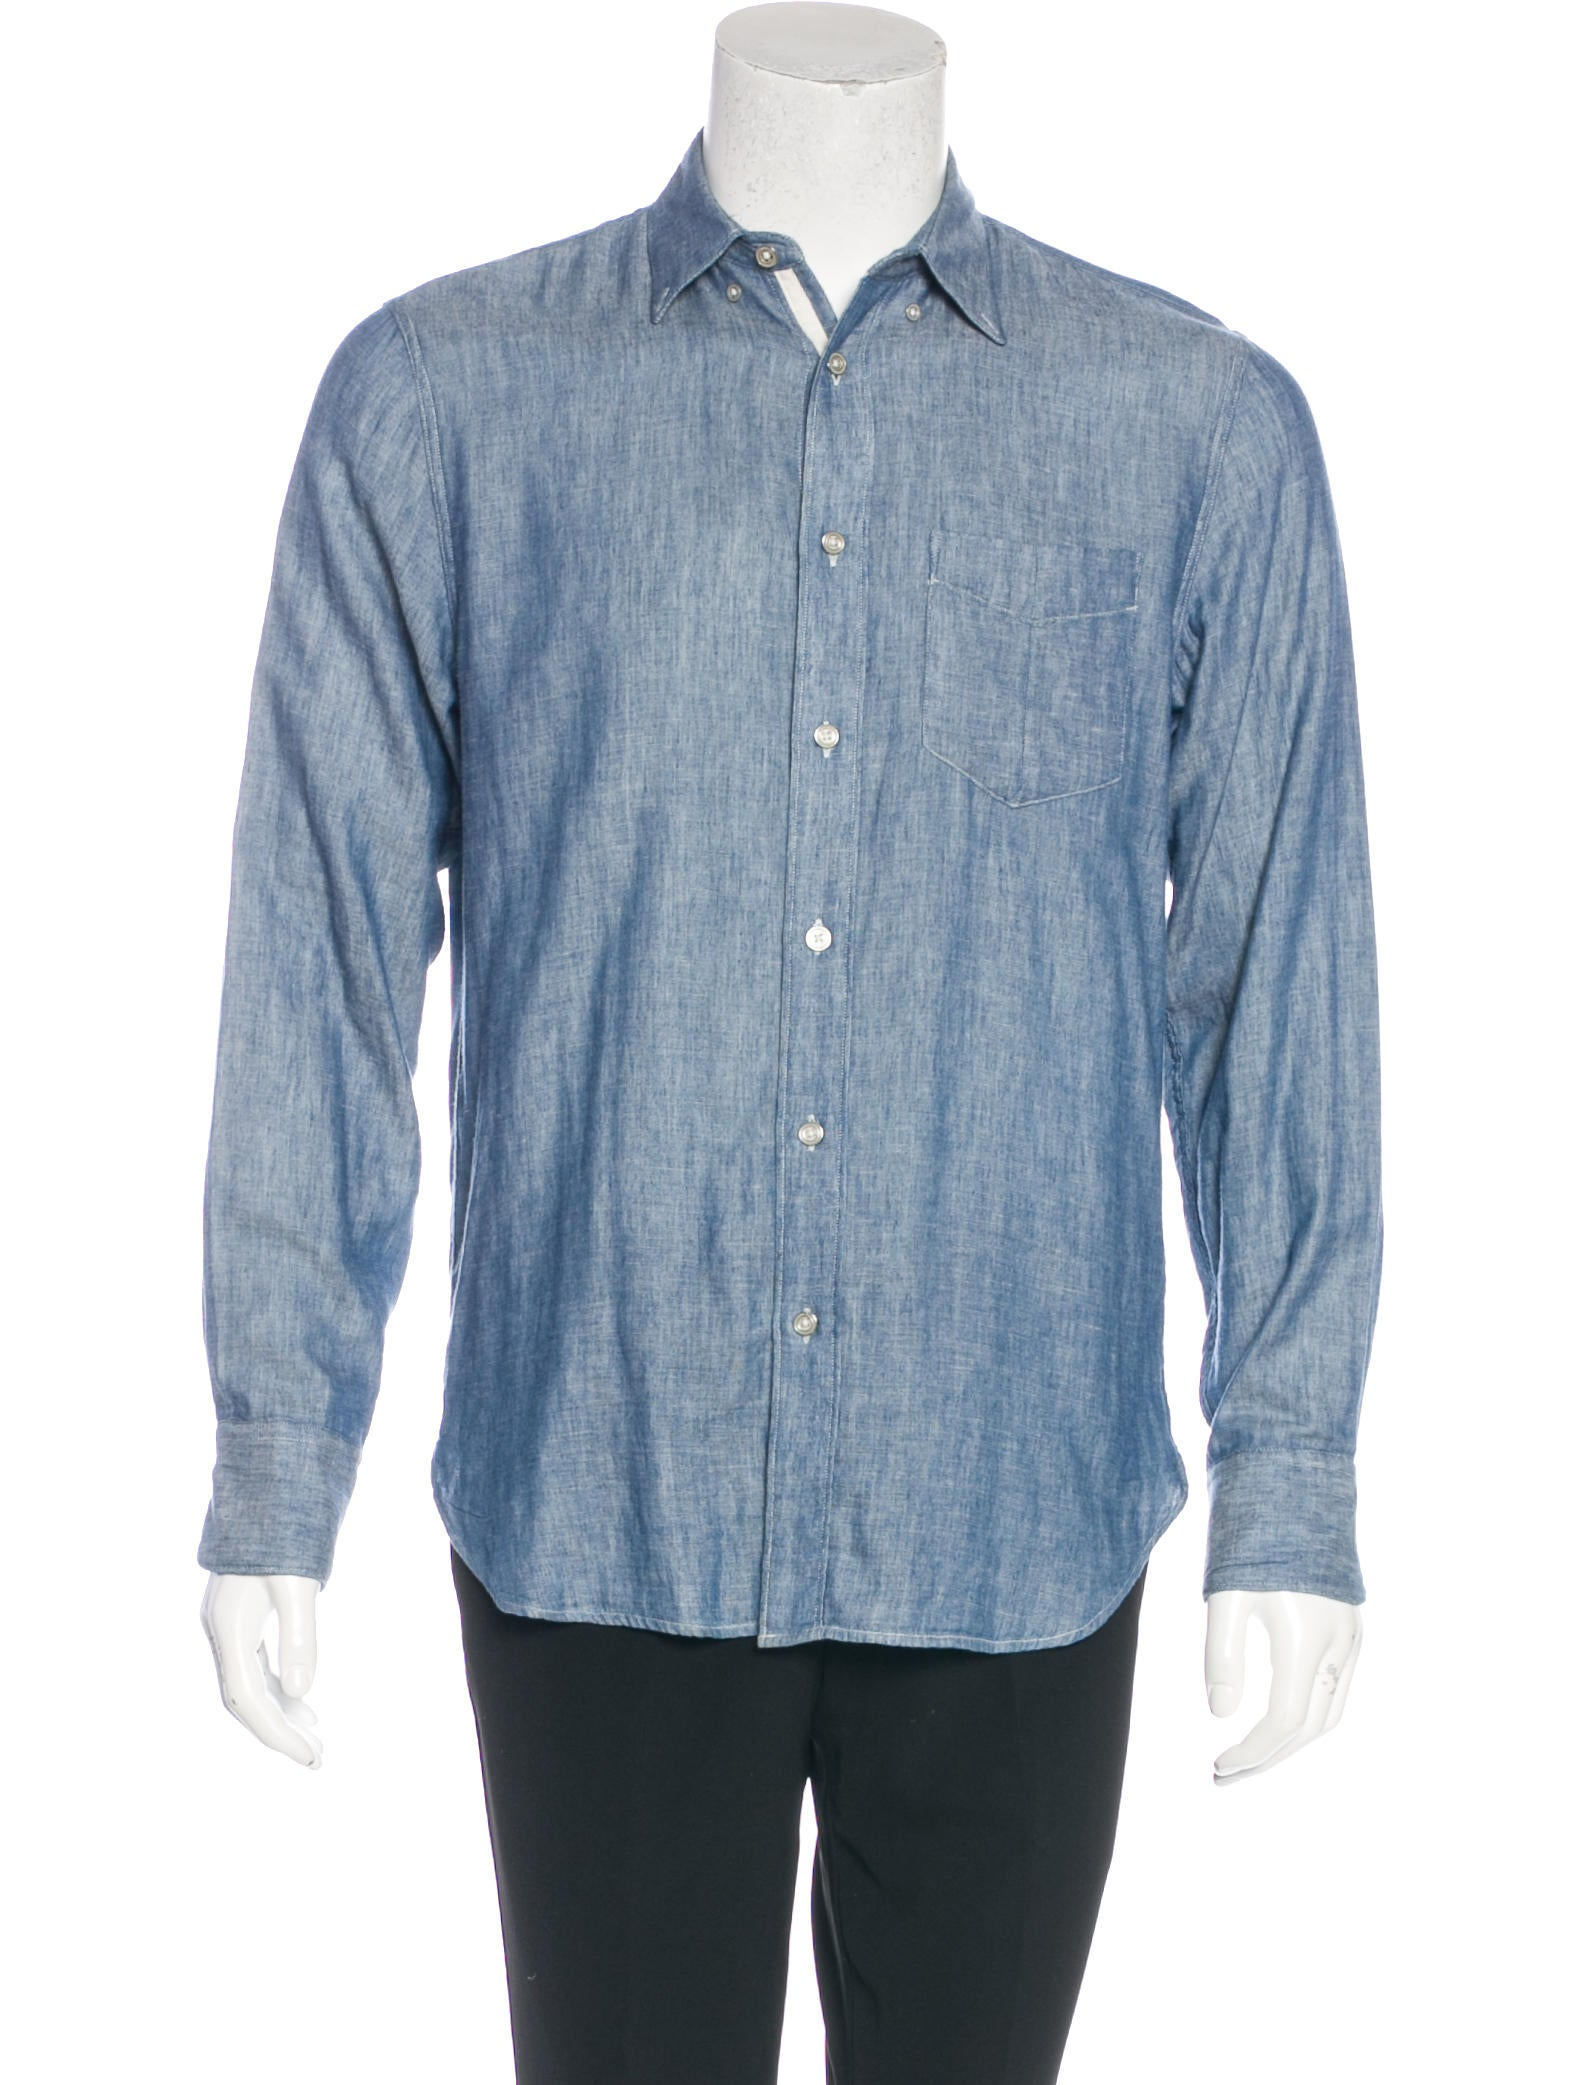 Rag bone chambray classic fit shirt clothing for Rag and bone mens shirts sale